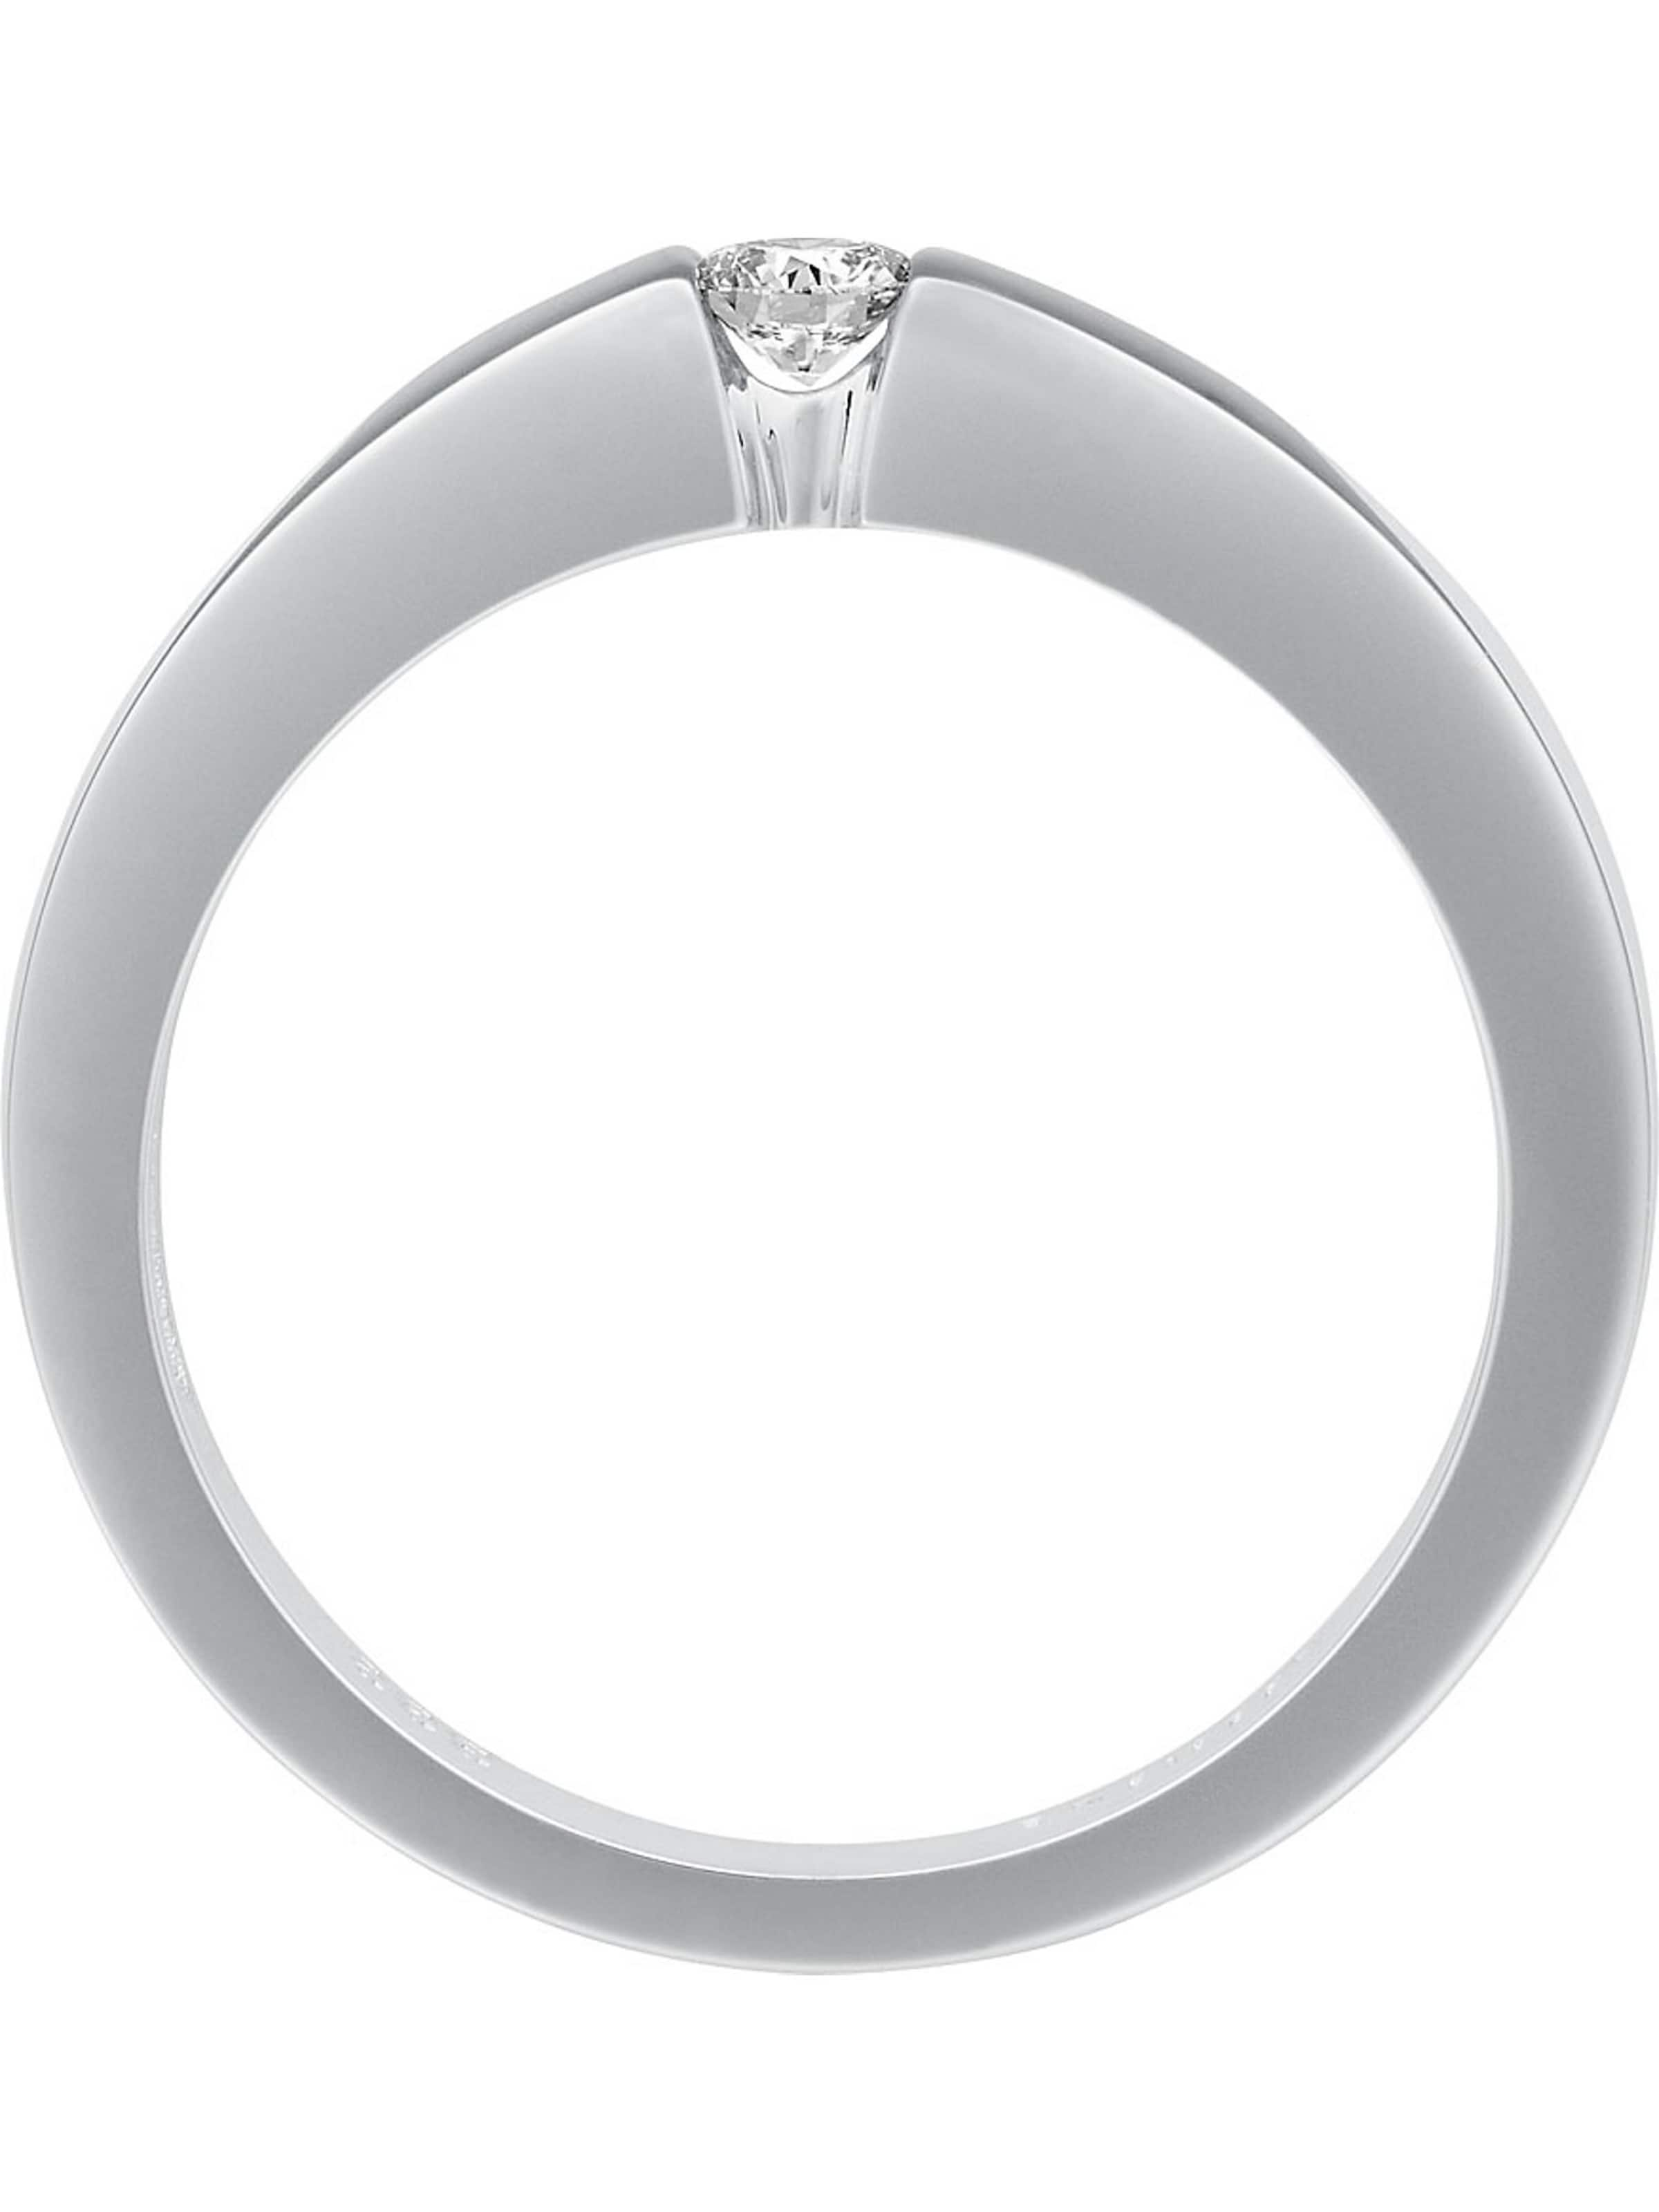 Ring Silber Christ In Silber Christ Ring Christ Ring Silber In Ring In In Christ yw8nONvm0